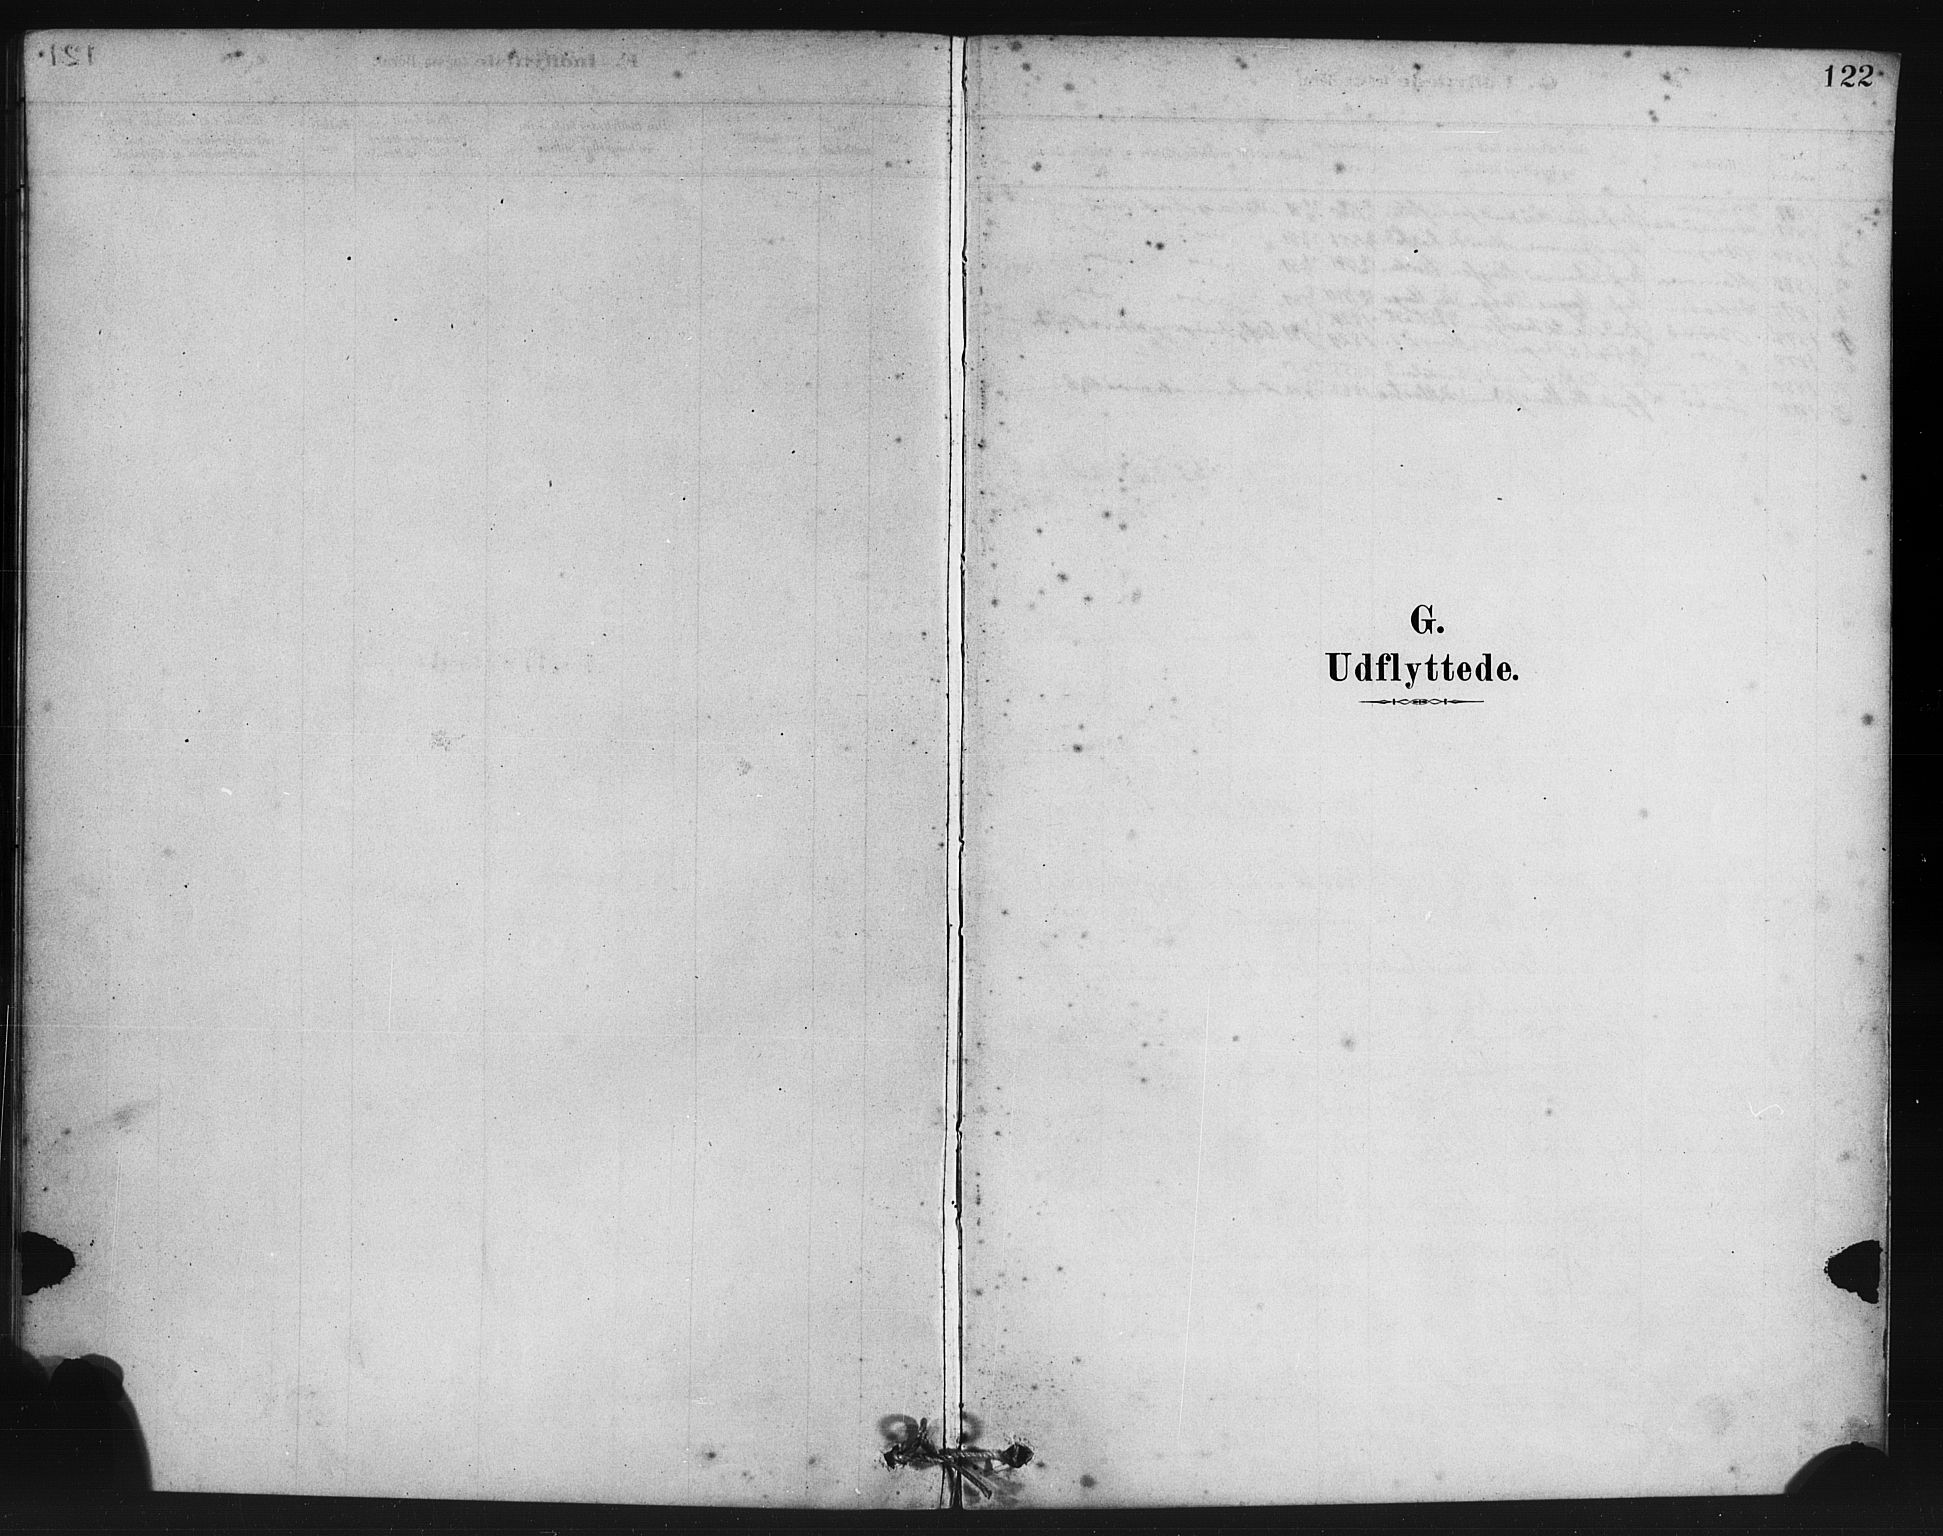 SAB, Manger sokneprestembete, H/Haa: Parish register (official) no. B 1, 1881-1892, p. 122